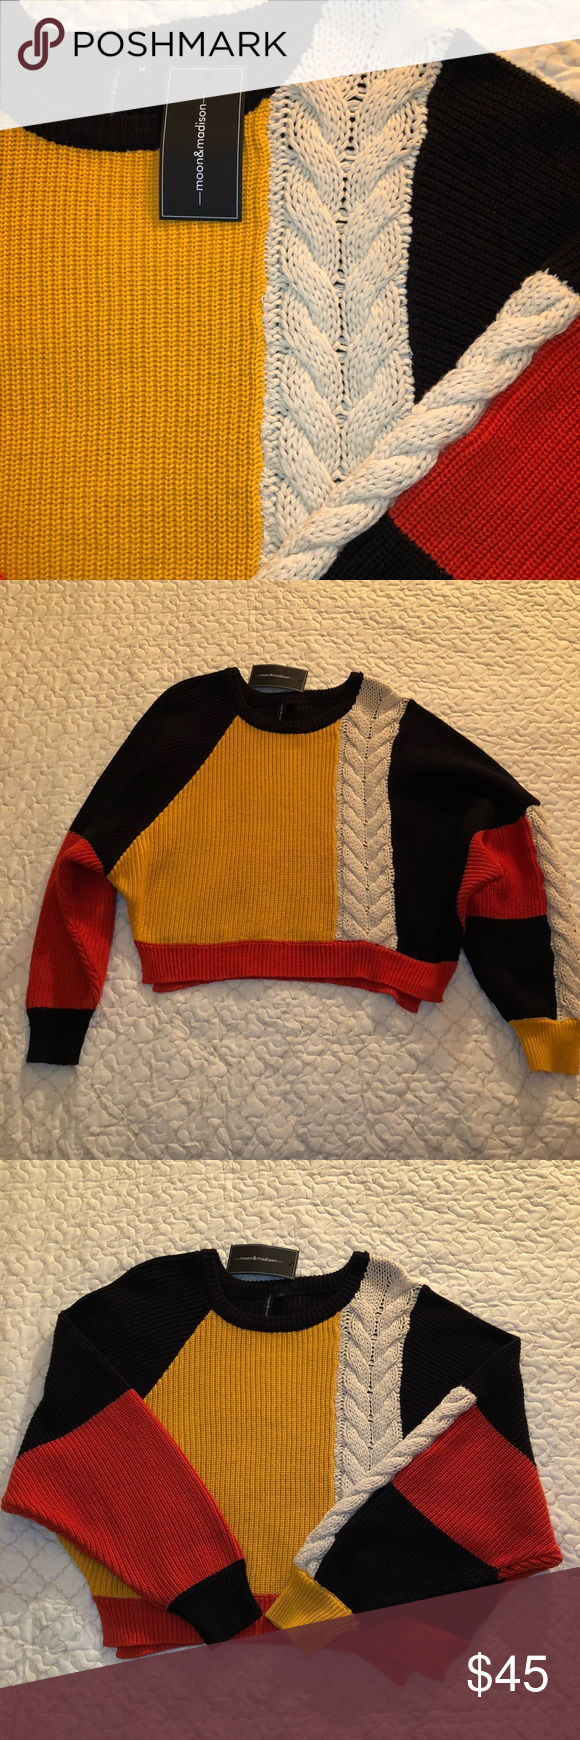 New Moon Madison Chunky Cropped Sweater Medium Nwt My Posh